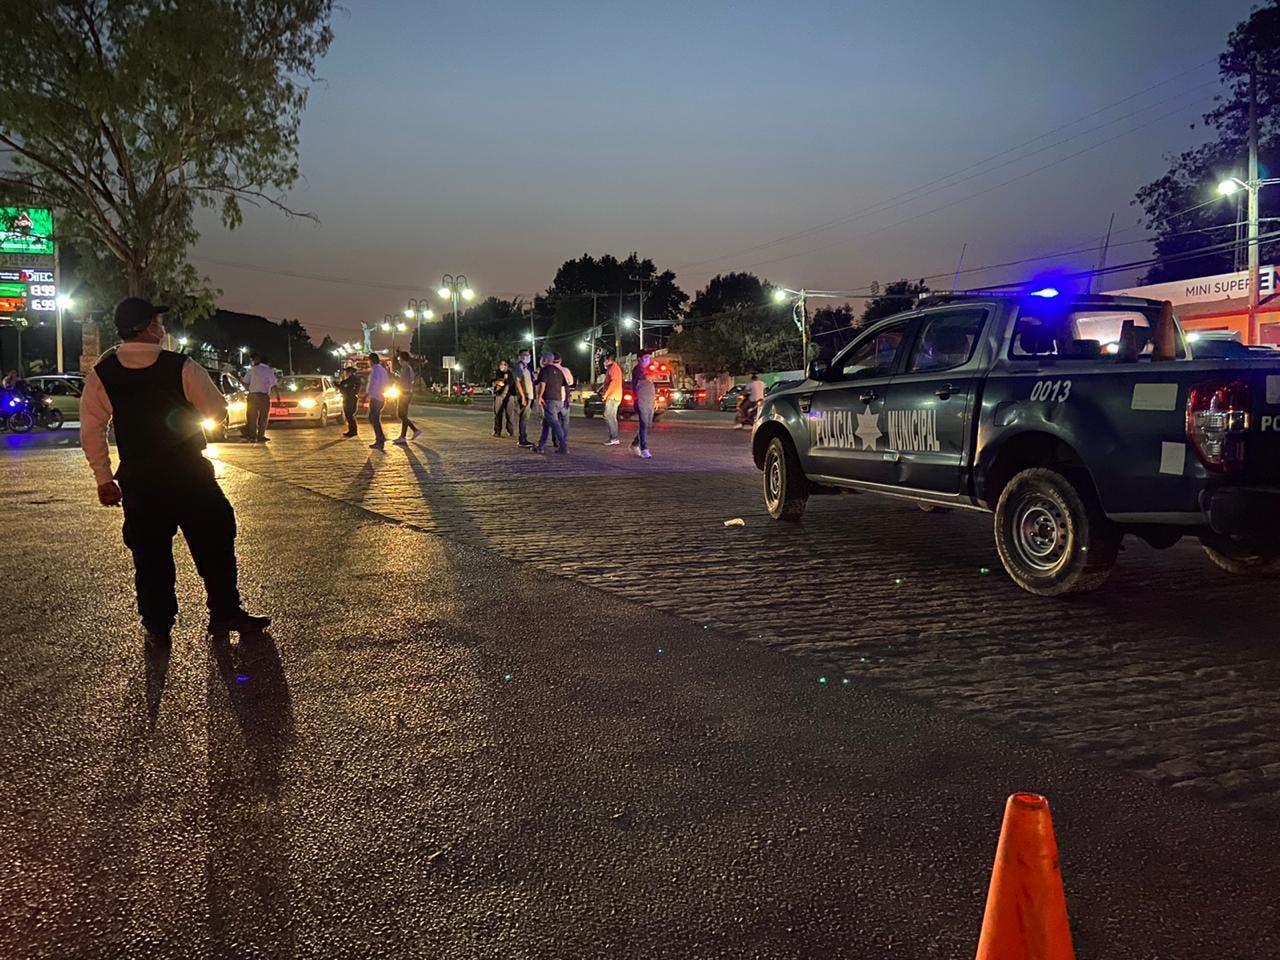 Cierran acceso a Tepoztlán e instalan retenes; impiden entrada a turistas